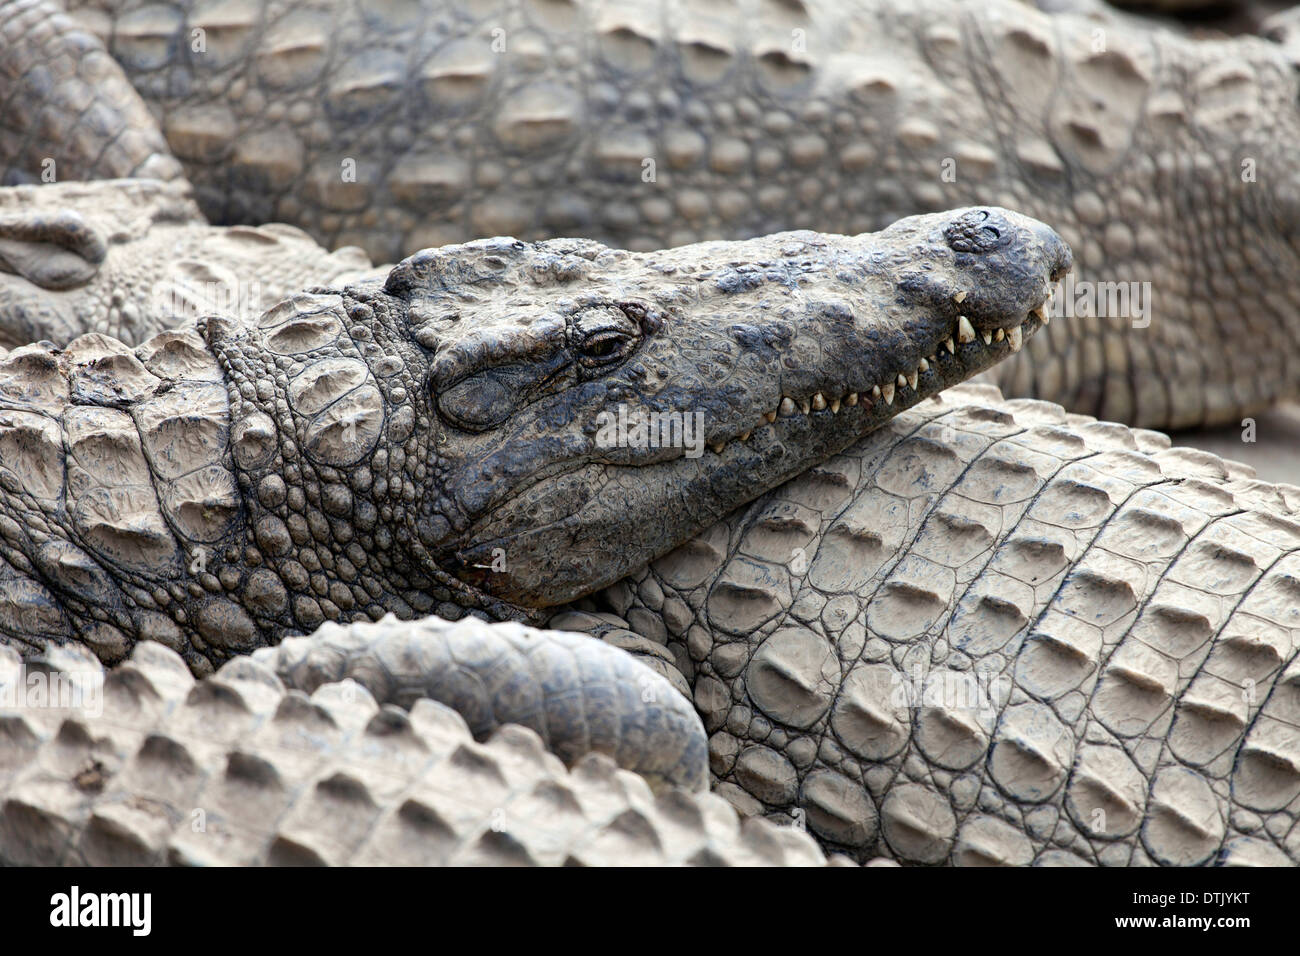 Crocodiles on Antananarivo Crocodile farm - Stock Image